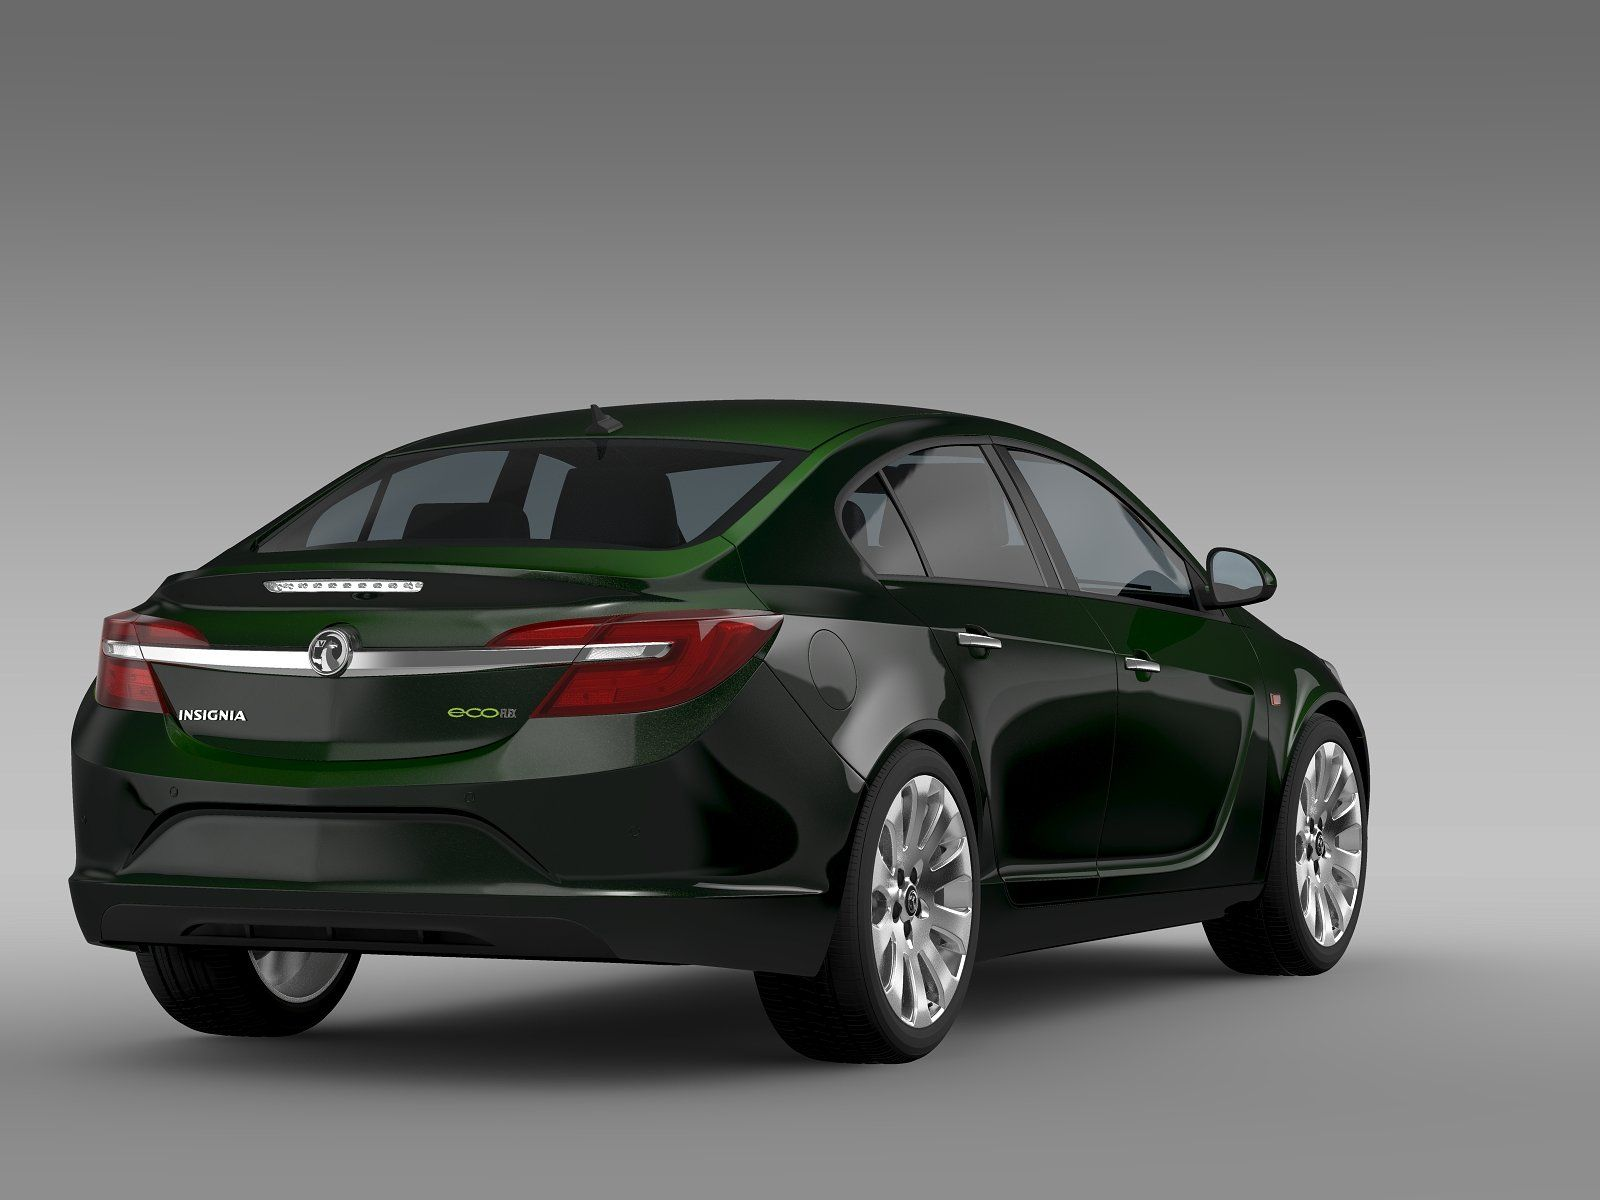 Vauxhall Insignia Ecoflex 2015 With Images Vauxhall Insignia Vauxhall Hatchback